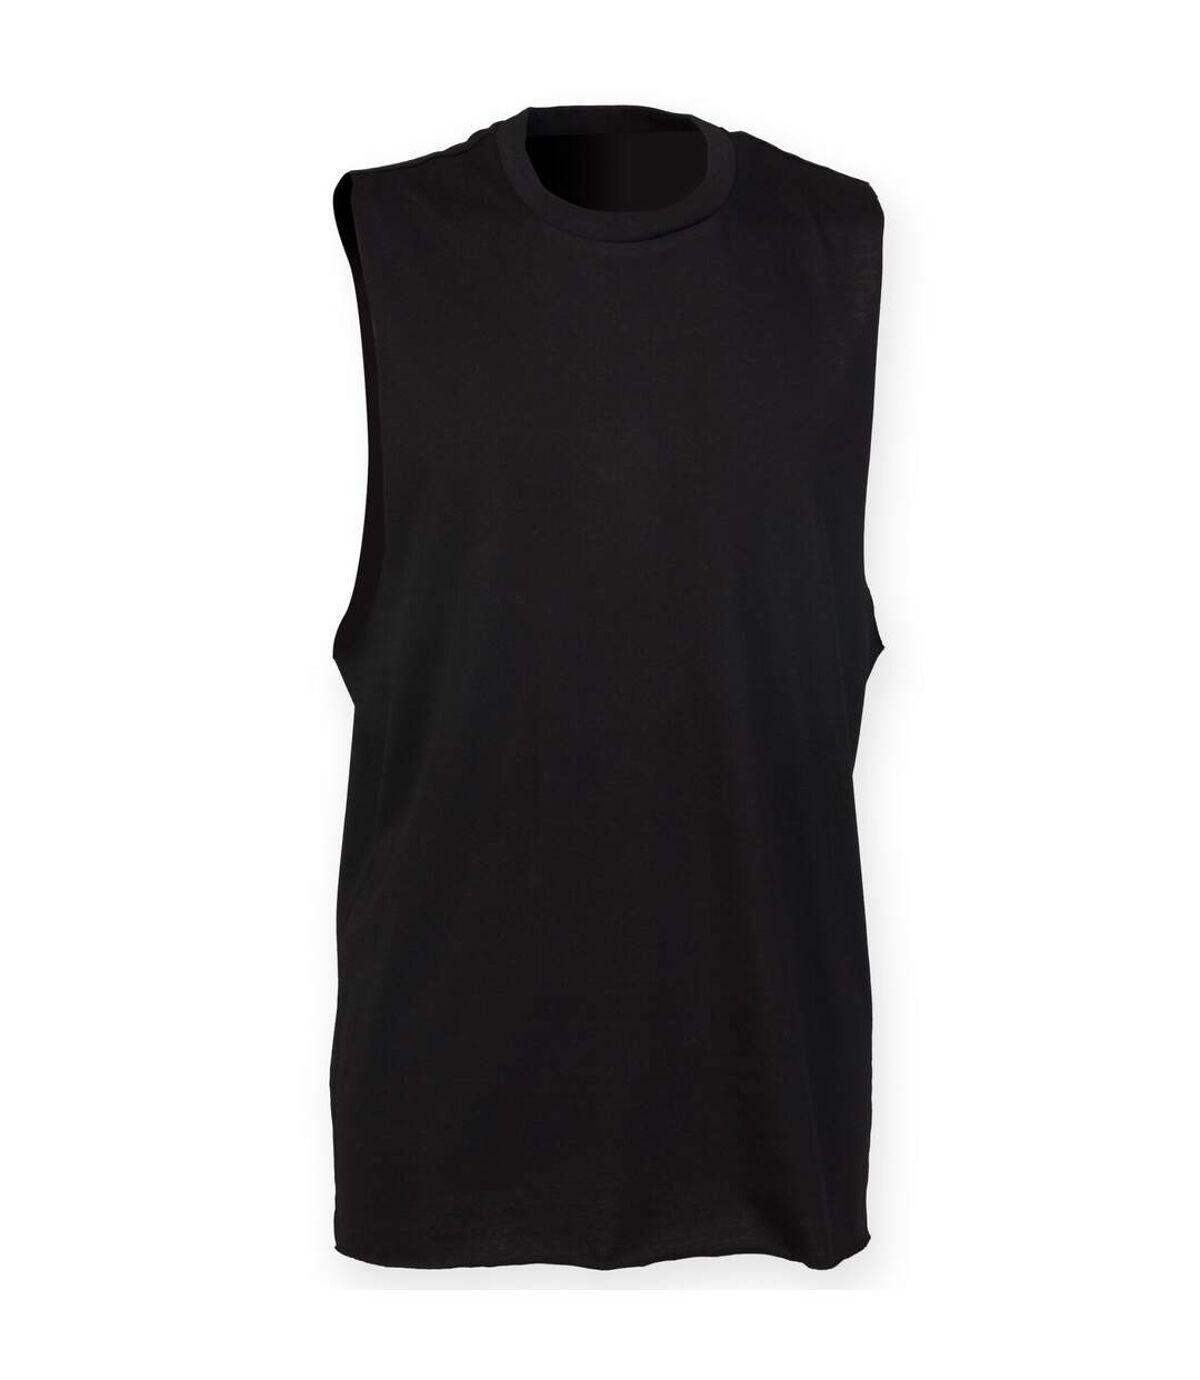 Skinnifit Mens High Neck Slash Armhole Vest (Black) - UTRW4739